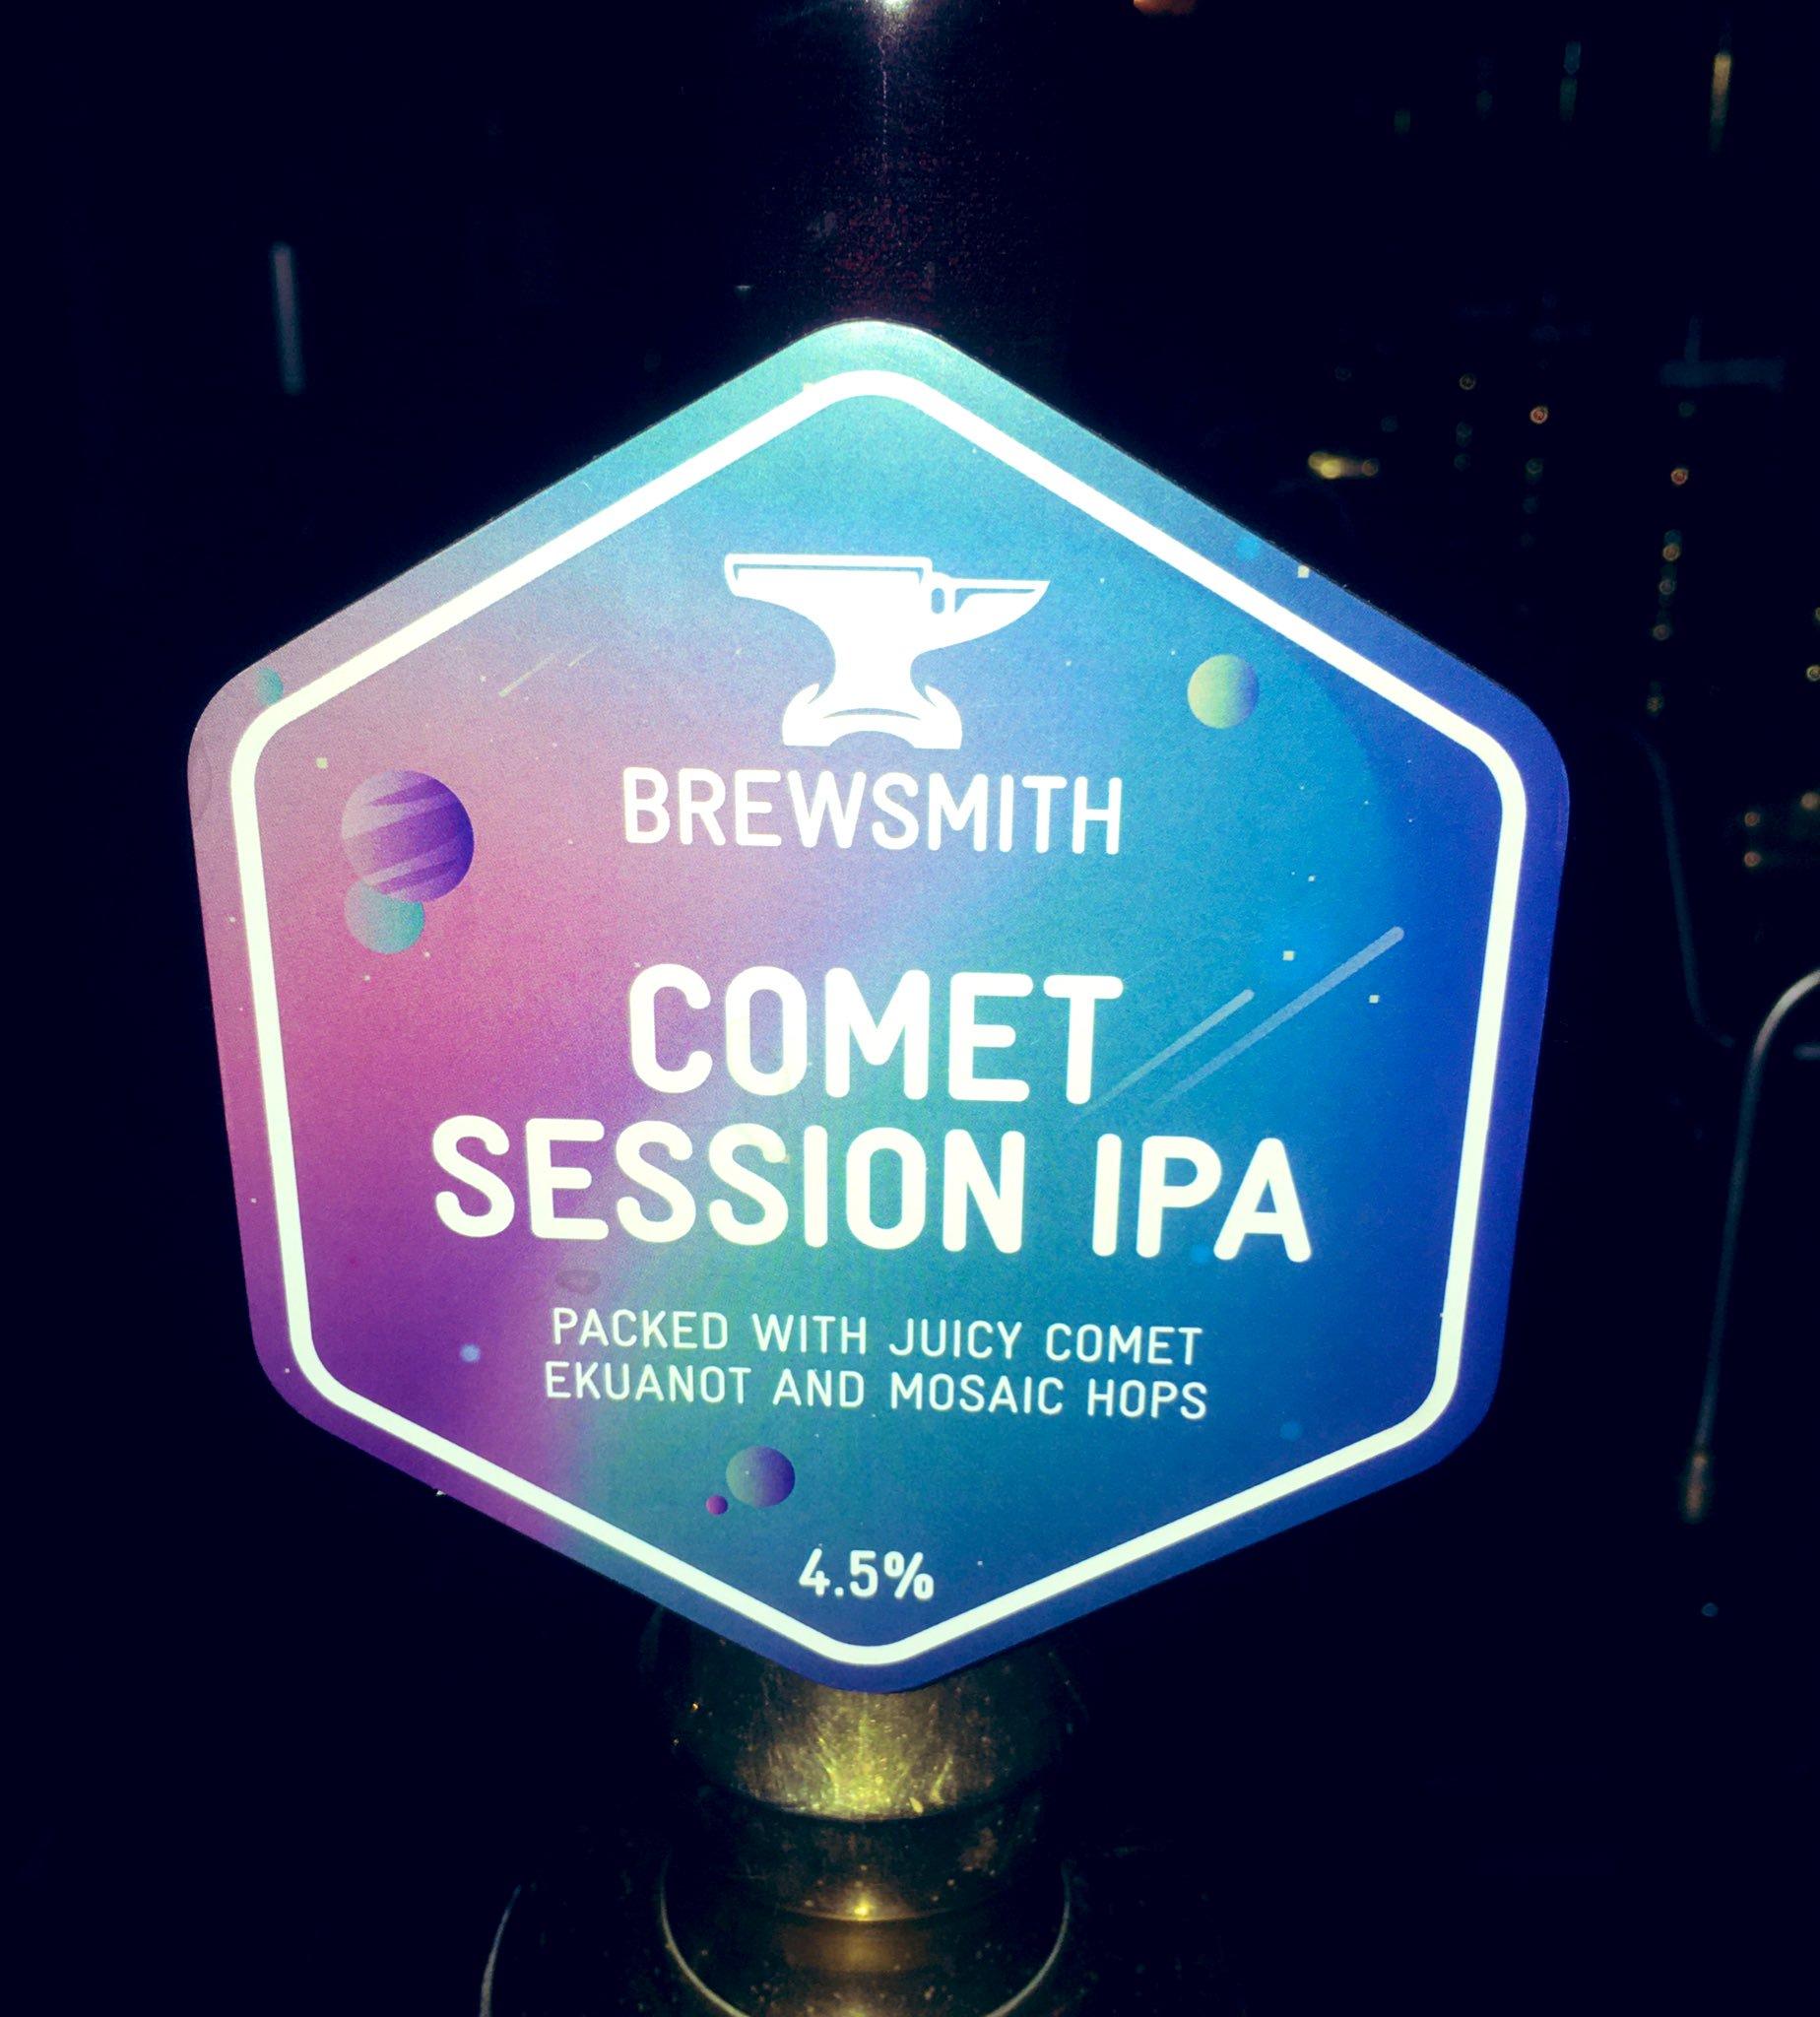 337: Comet Session